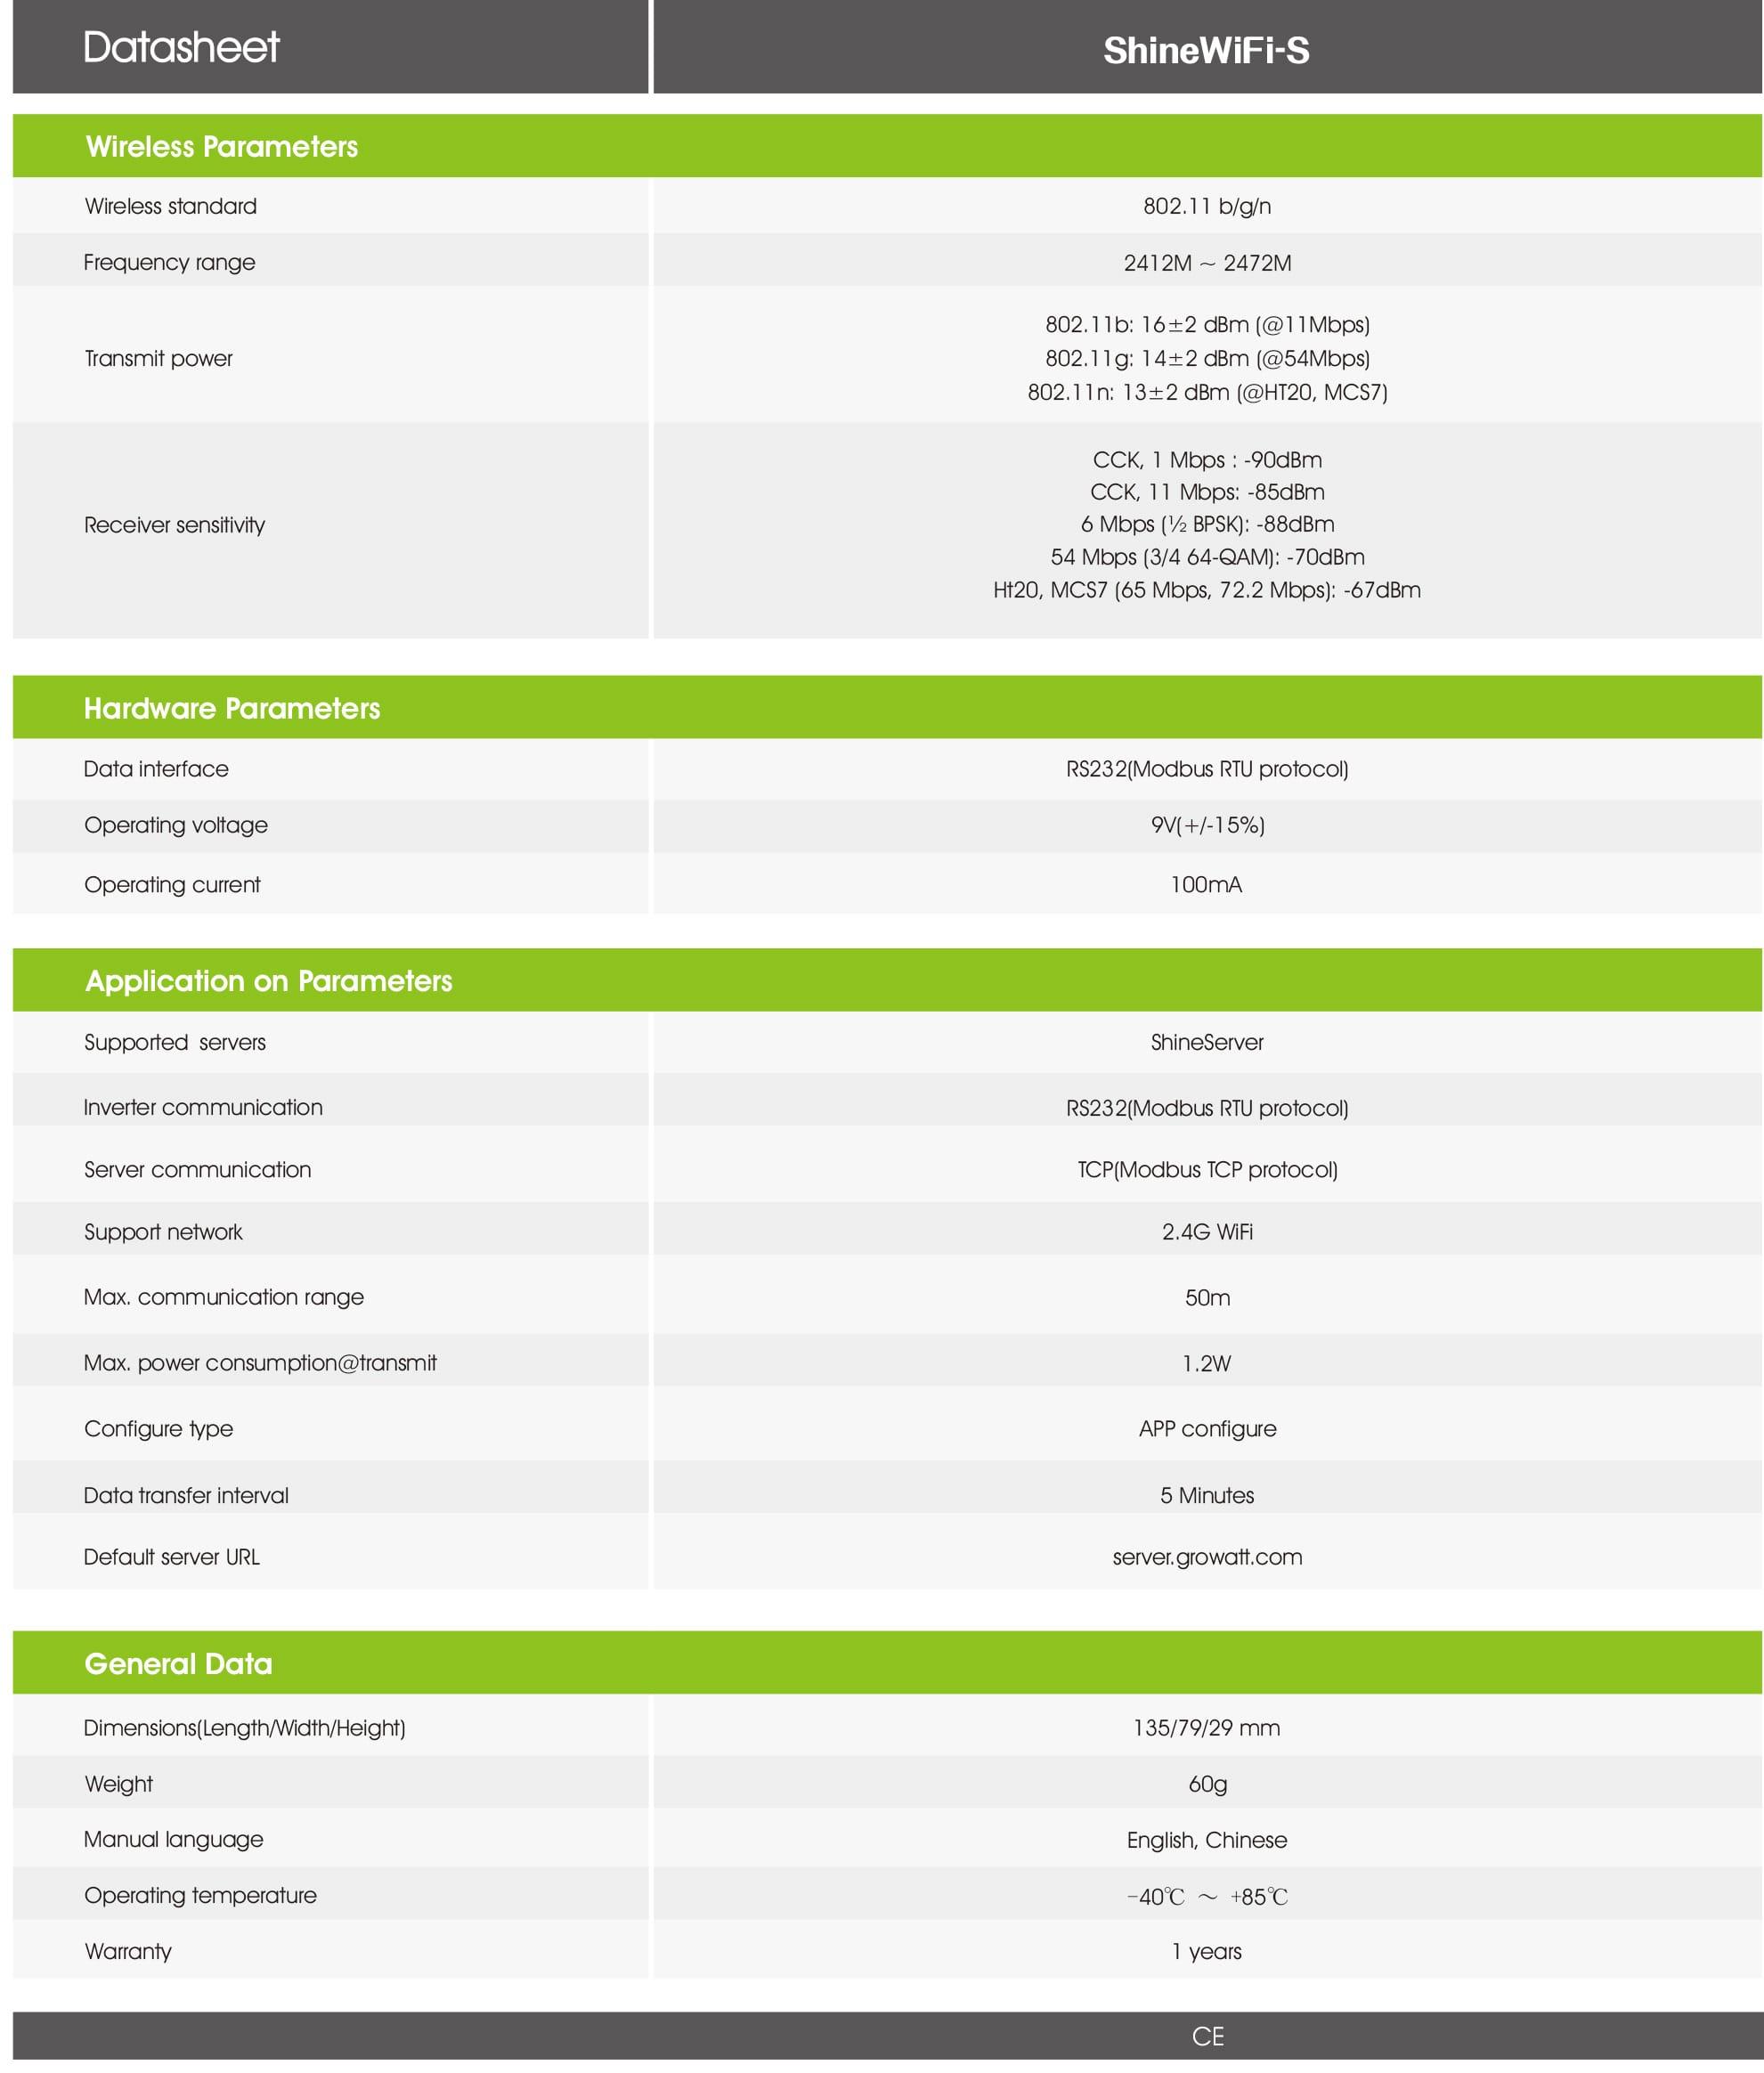 Shinewifi-S PDF | Sernolux.com